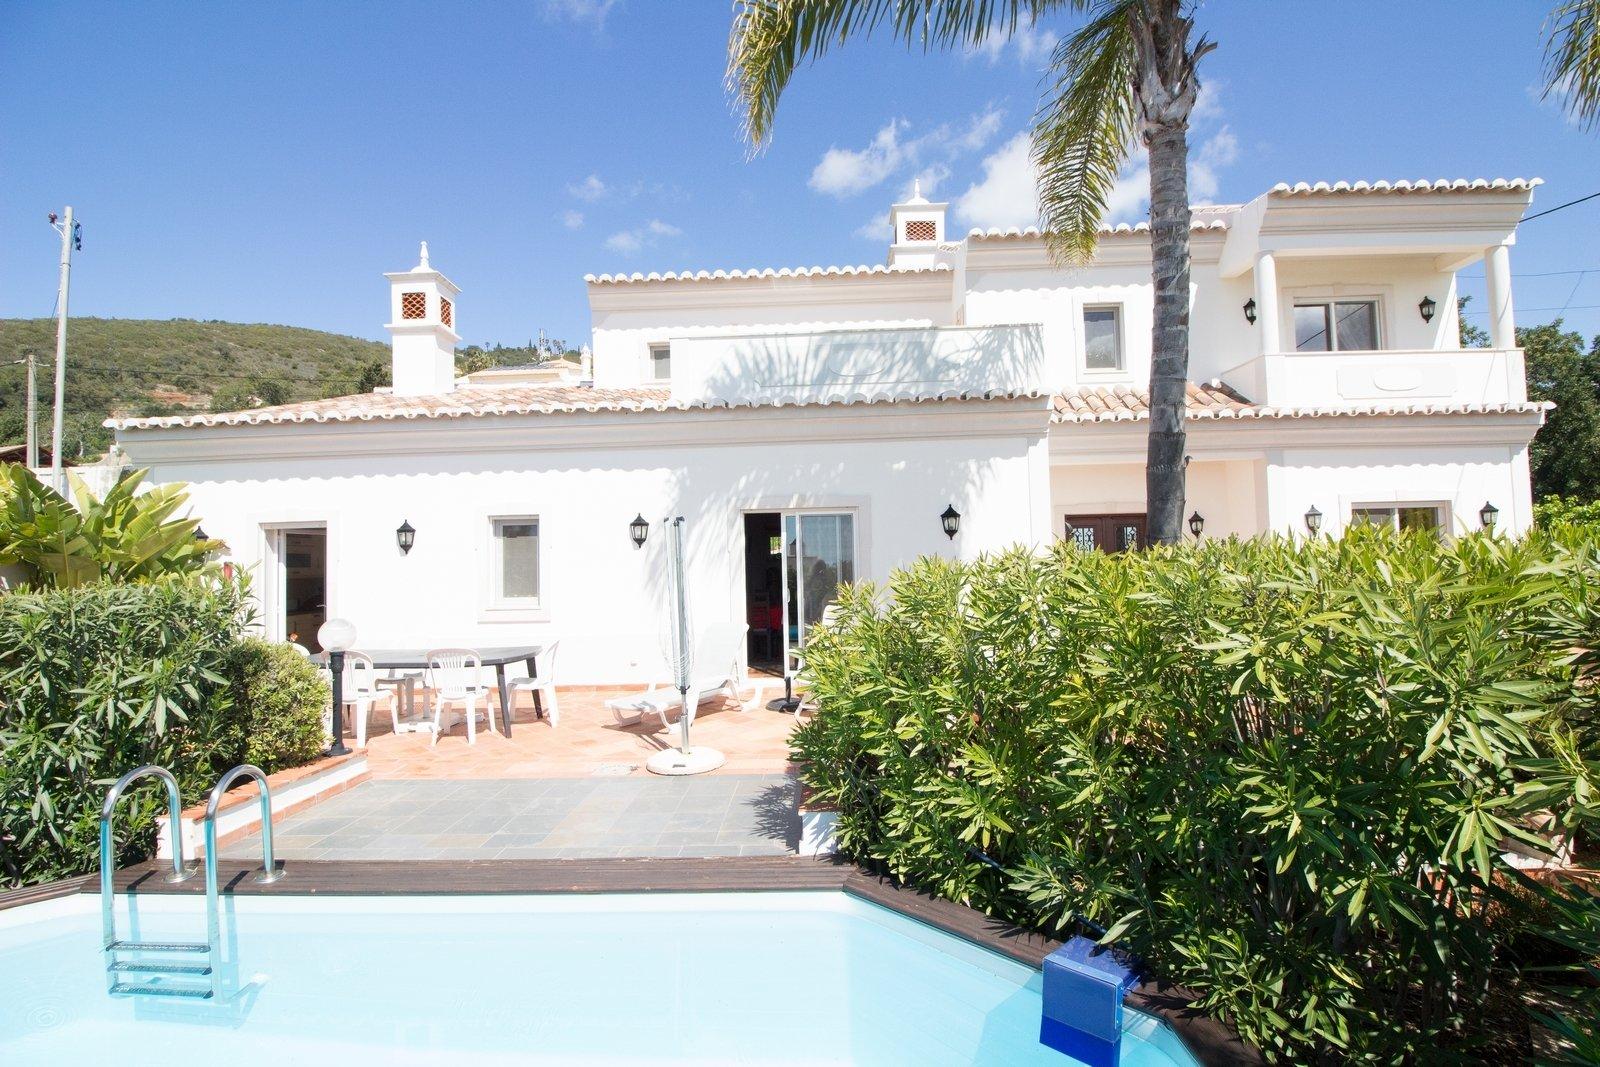 4 Bedroom Villa Santa Barbara de Nexe, Central Algarve Ref: PV3342